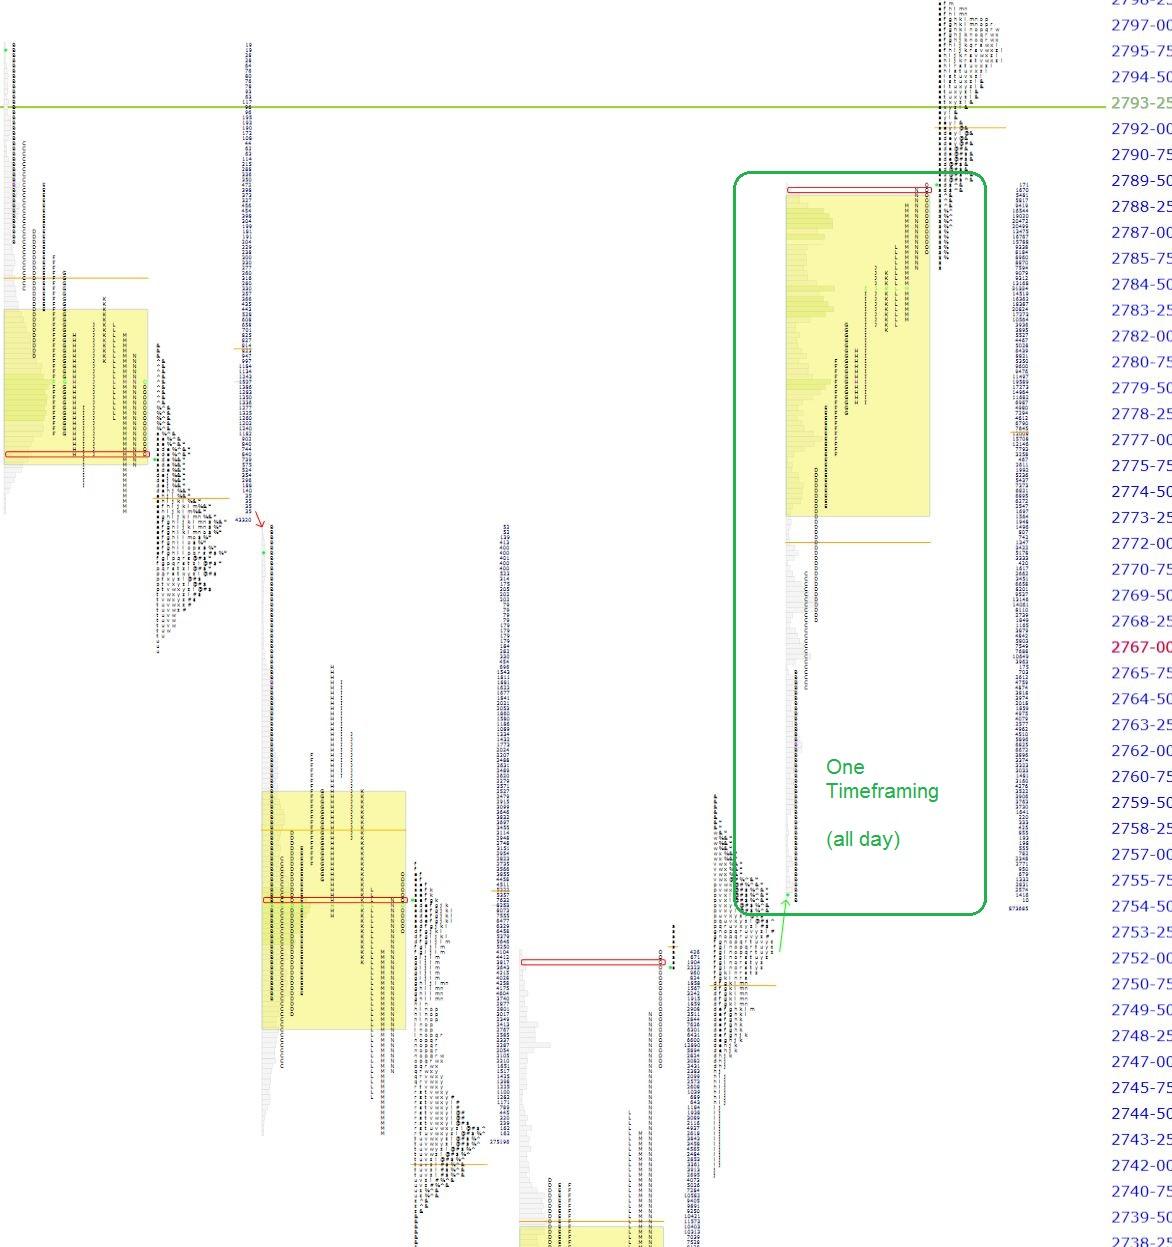 expanded market profile